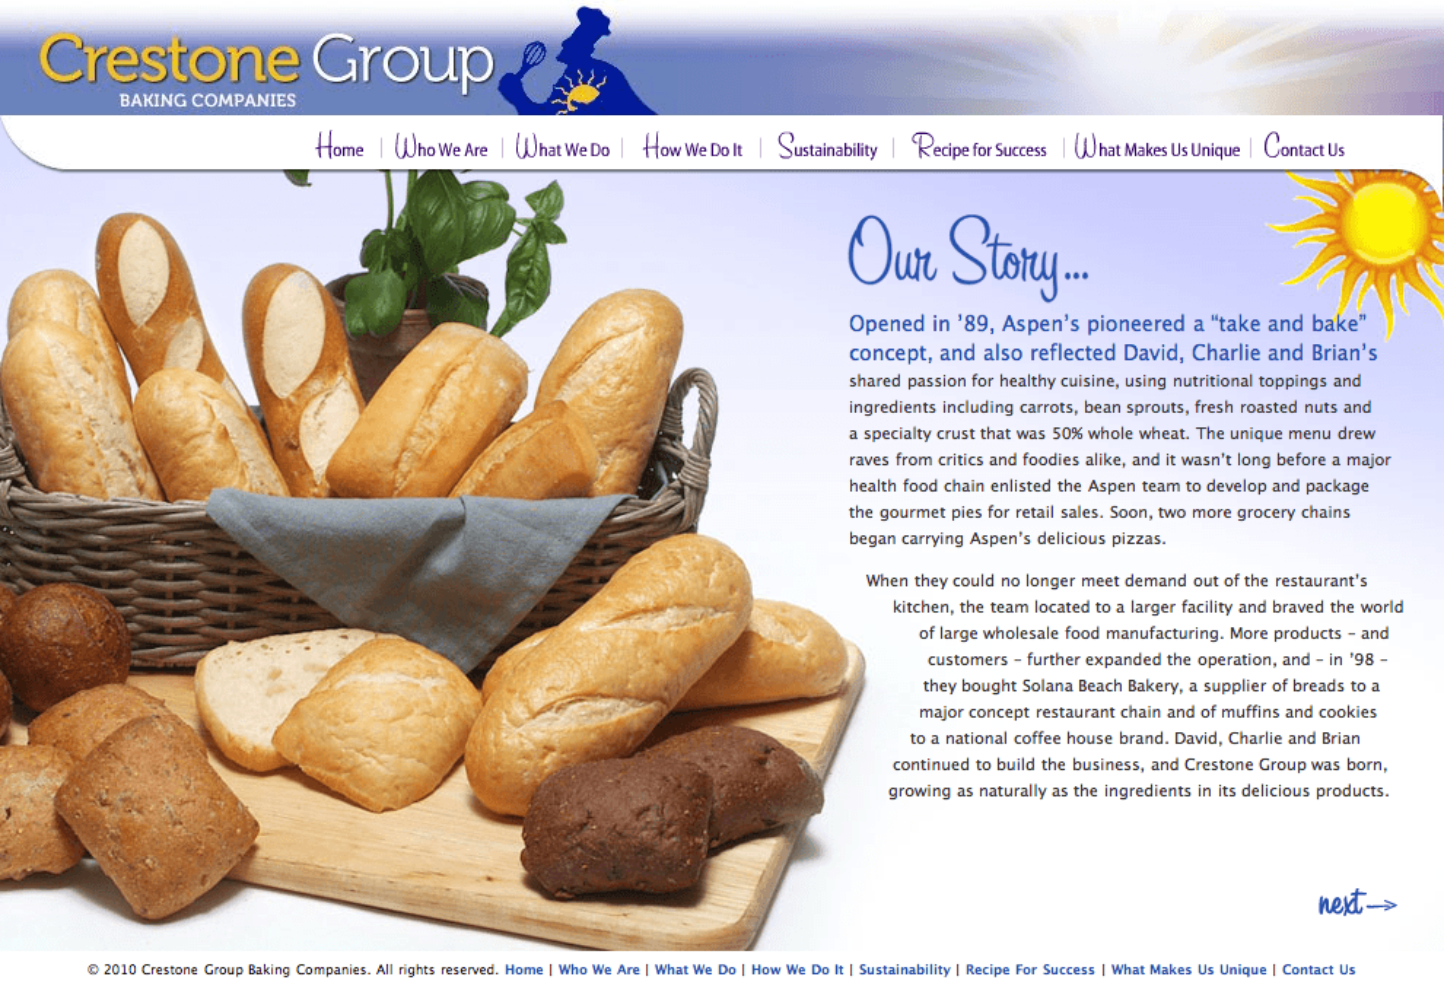 Crestone Group.com